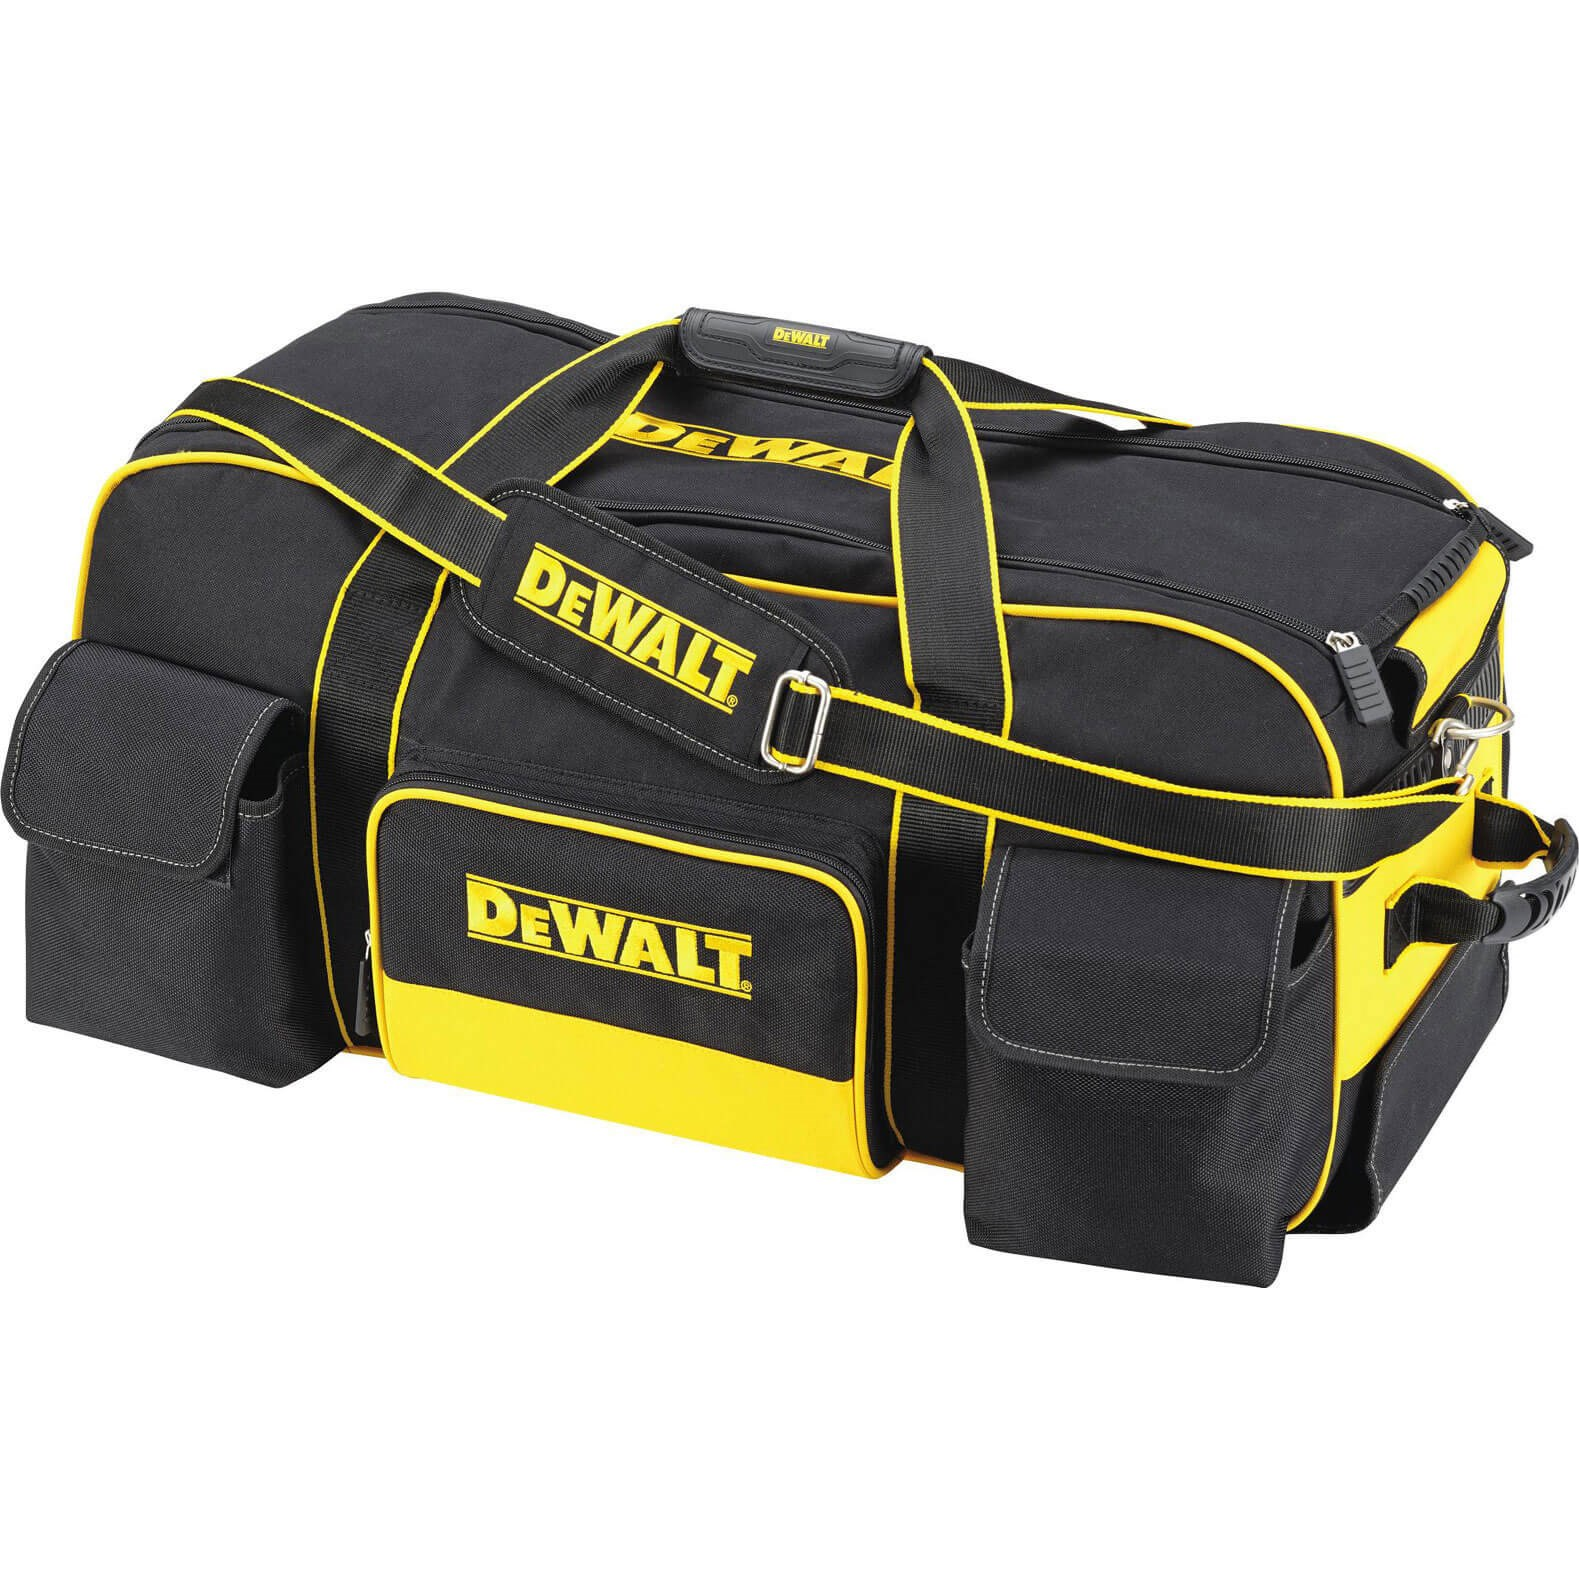 Dewalt Large Duffle Wheeled Tool Bag